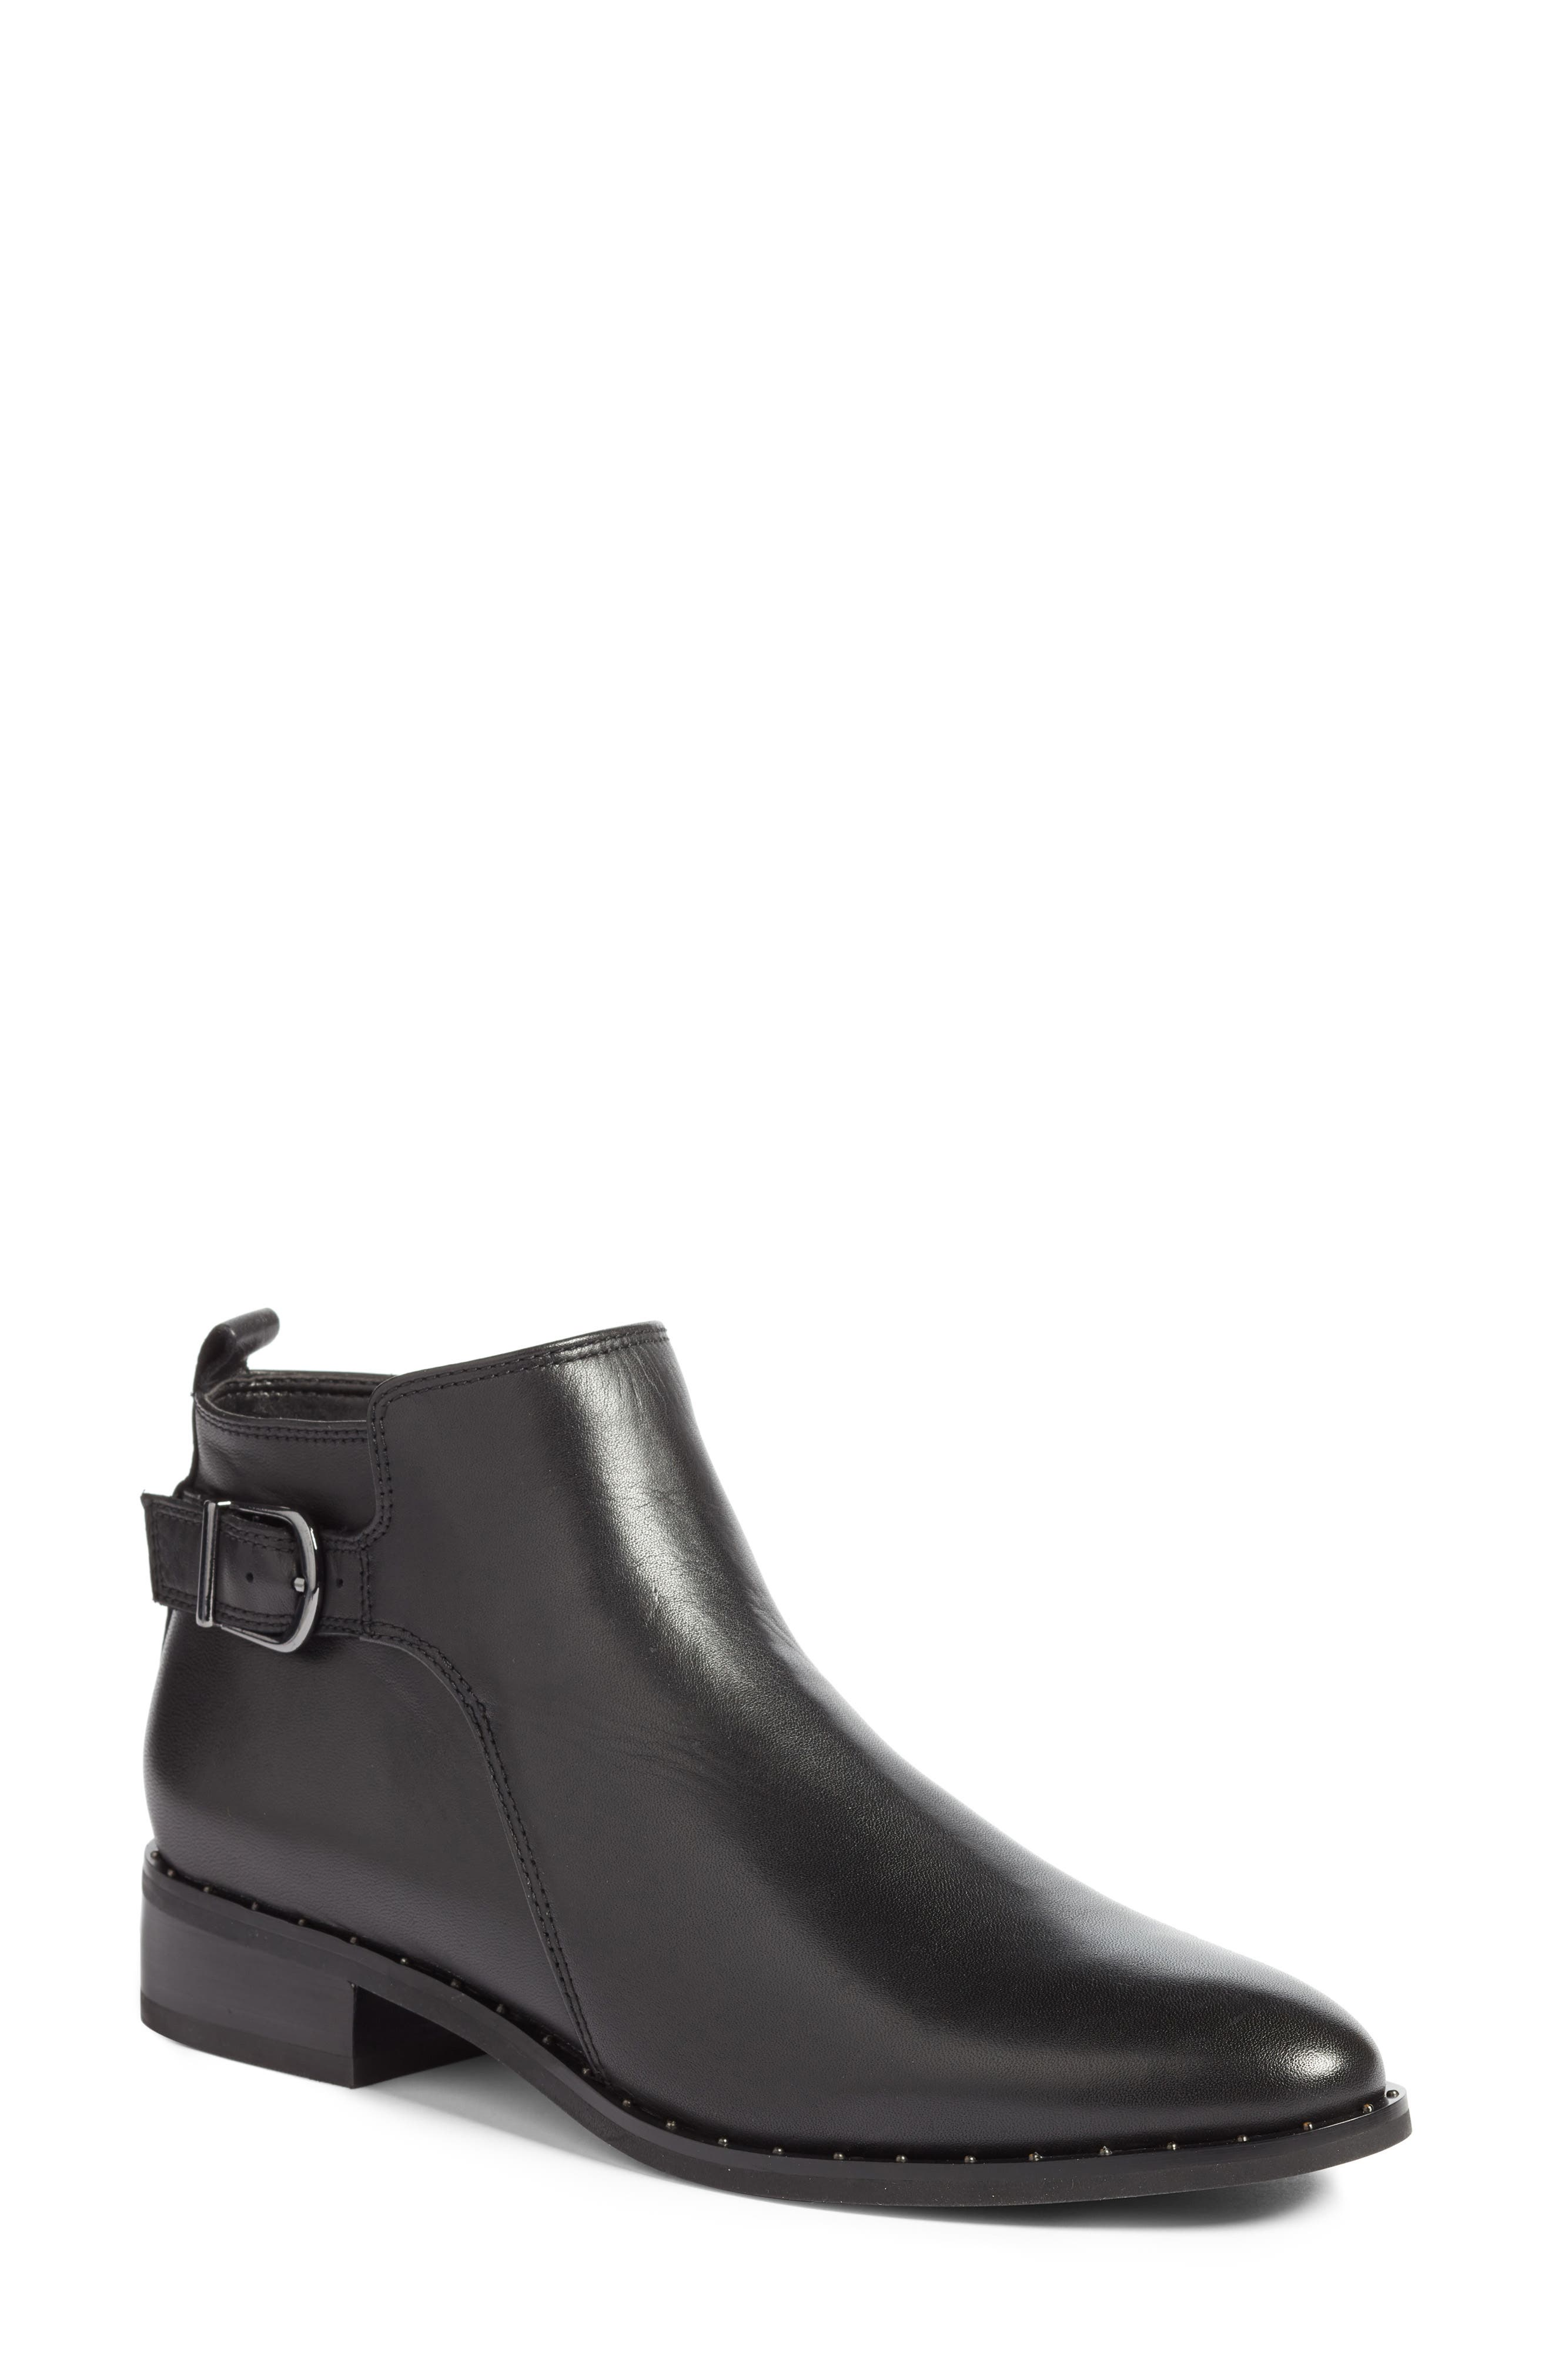 Blondo Tami Waterproof Moto Boot, Black